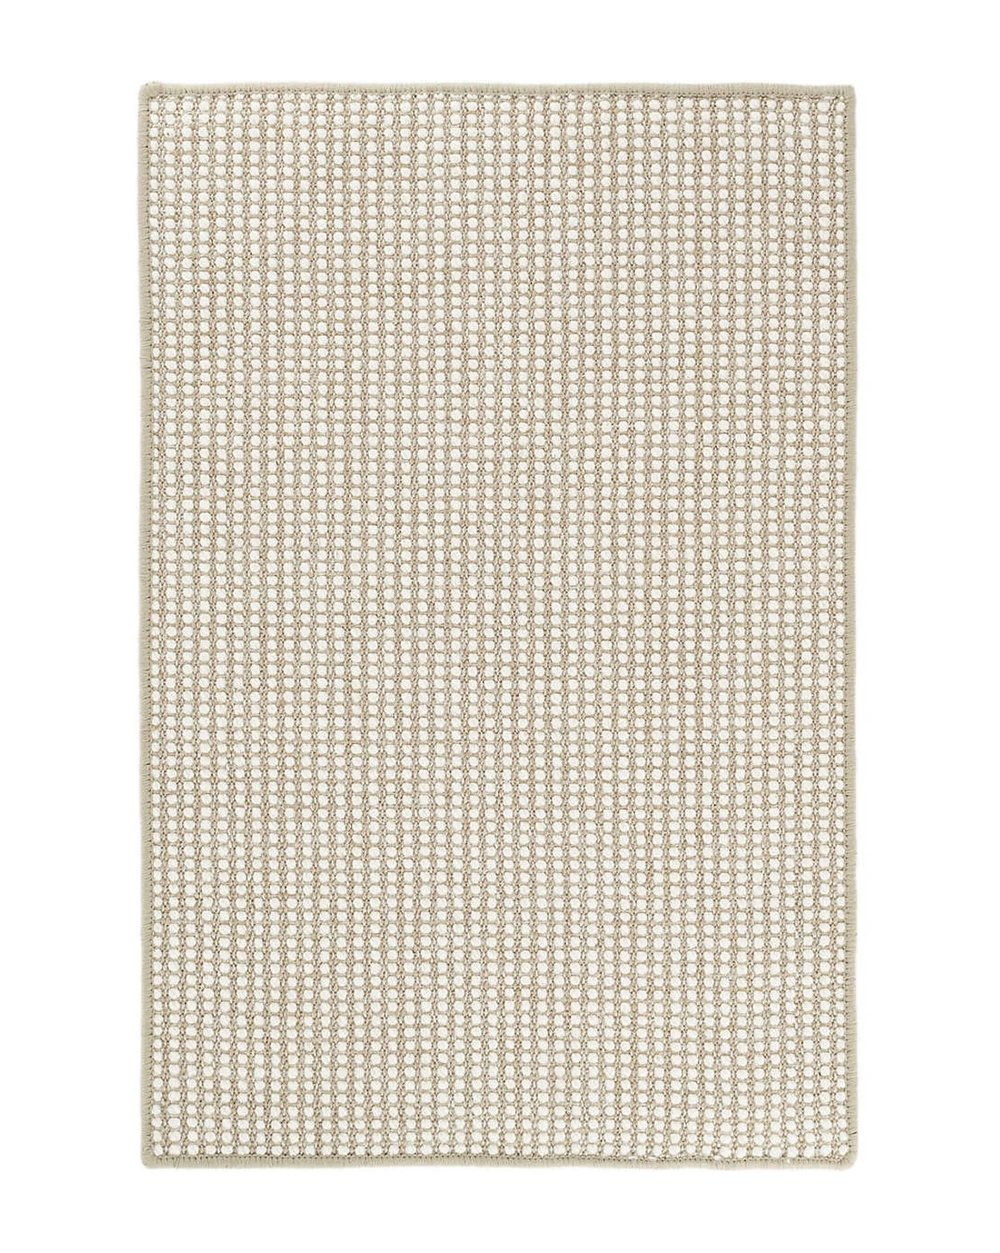 Pixel_Wheat_Woven_Wool_Rug_1.jpg